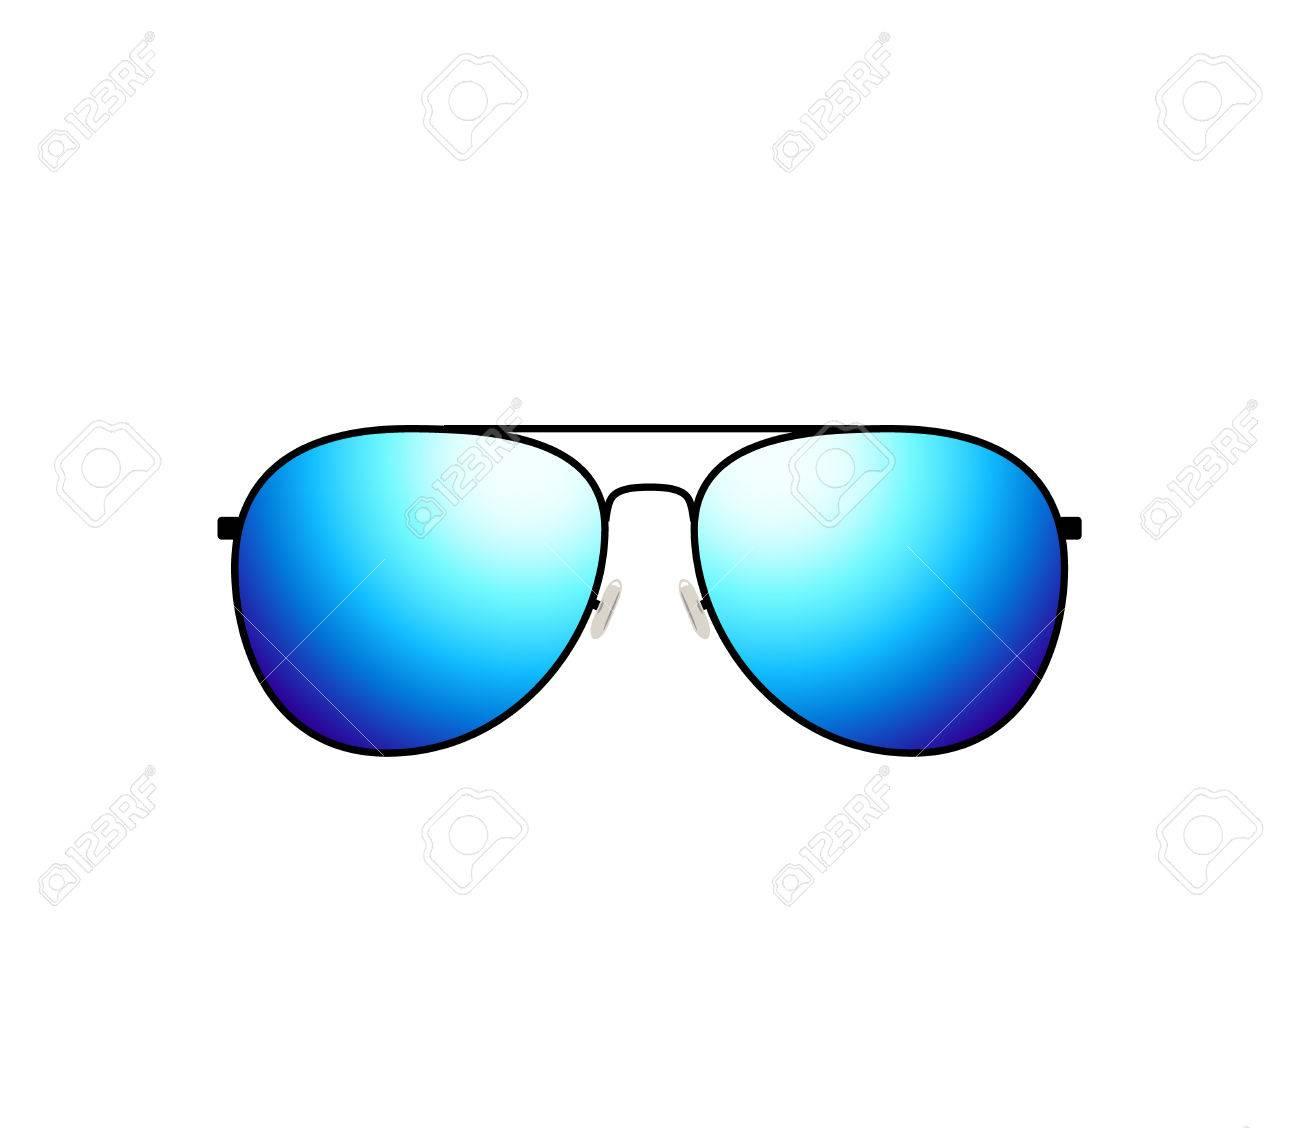 24690de5cf0 Glossy aviator sunglasses holiday summer vacation design Stock Vector -  68223275